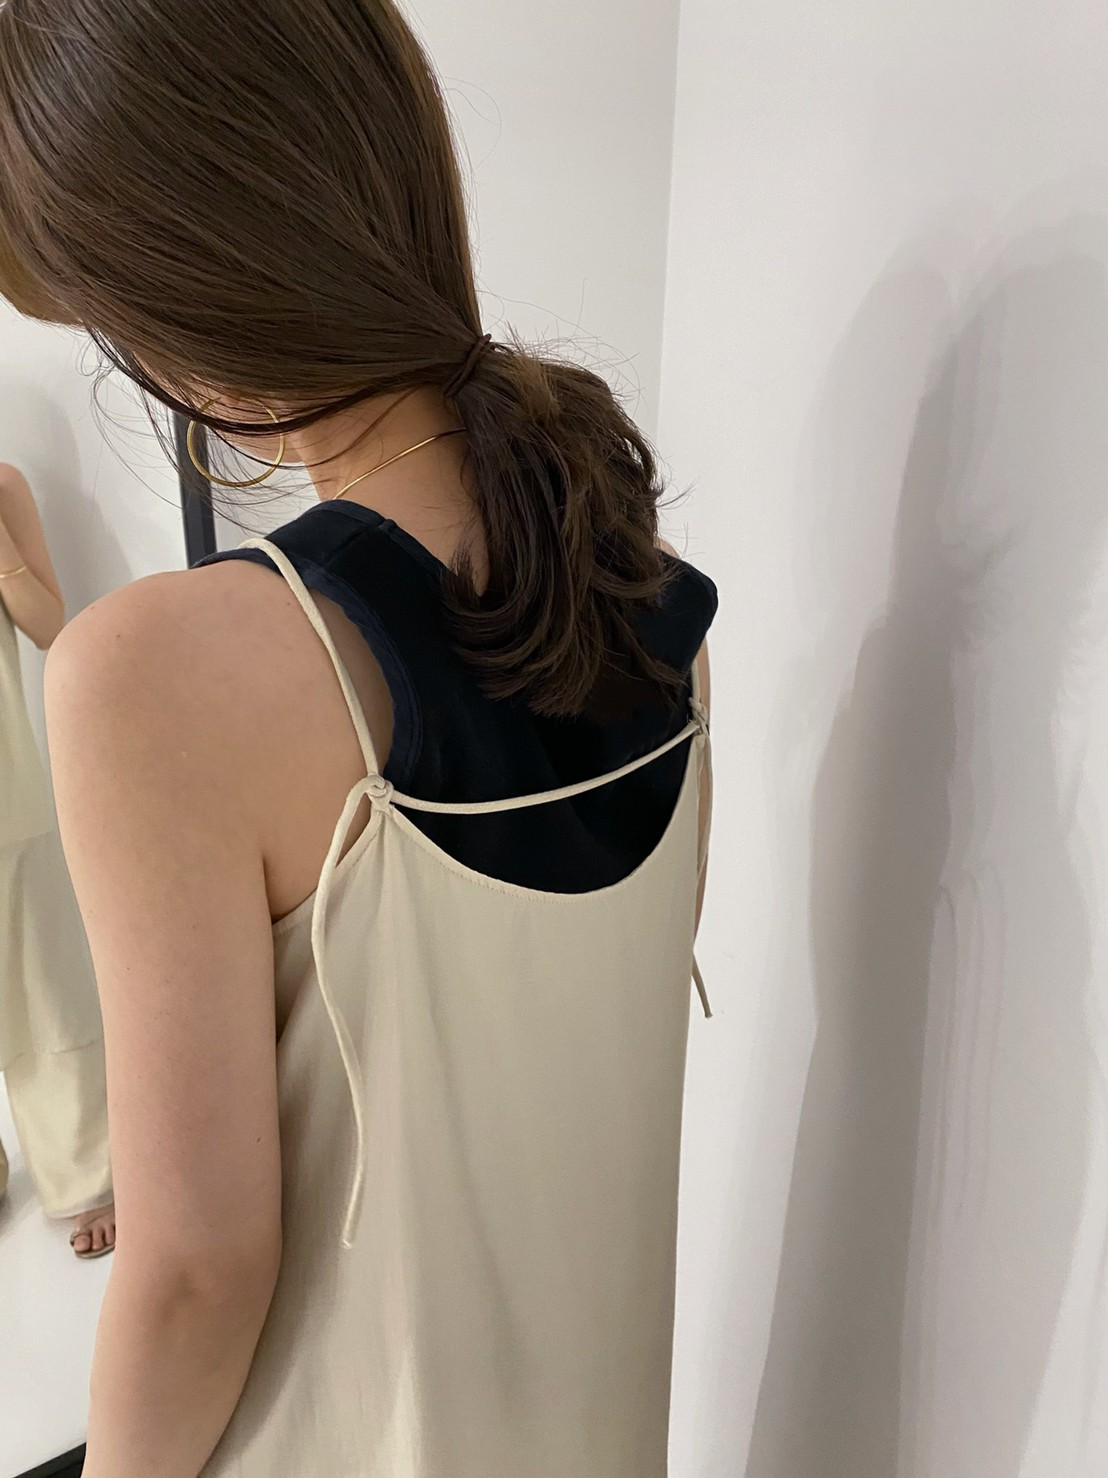 Jemma.atelier Hirona Marubayashi 丸林広奈 限定コラボ ジェマ アトリエ